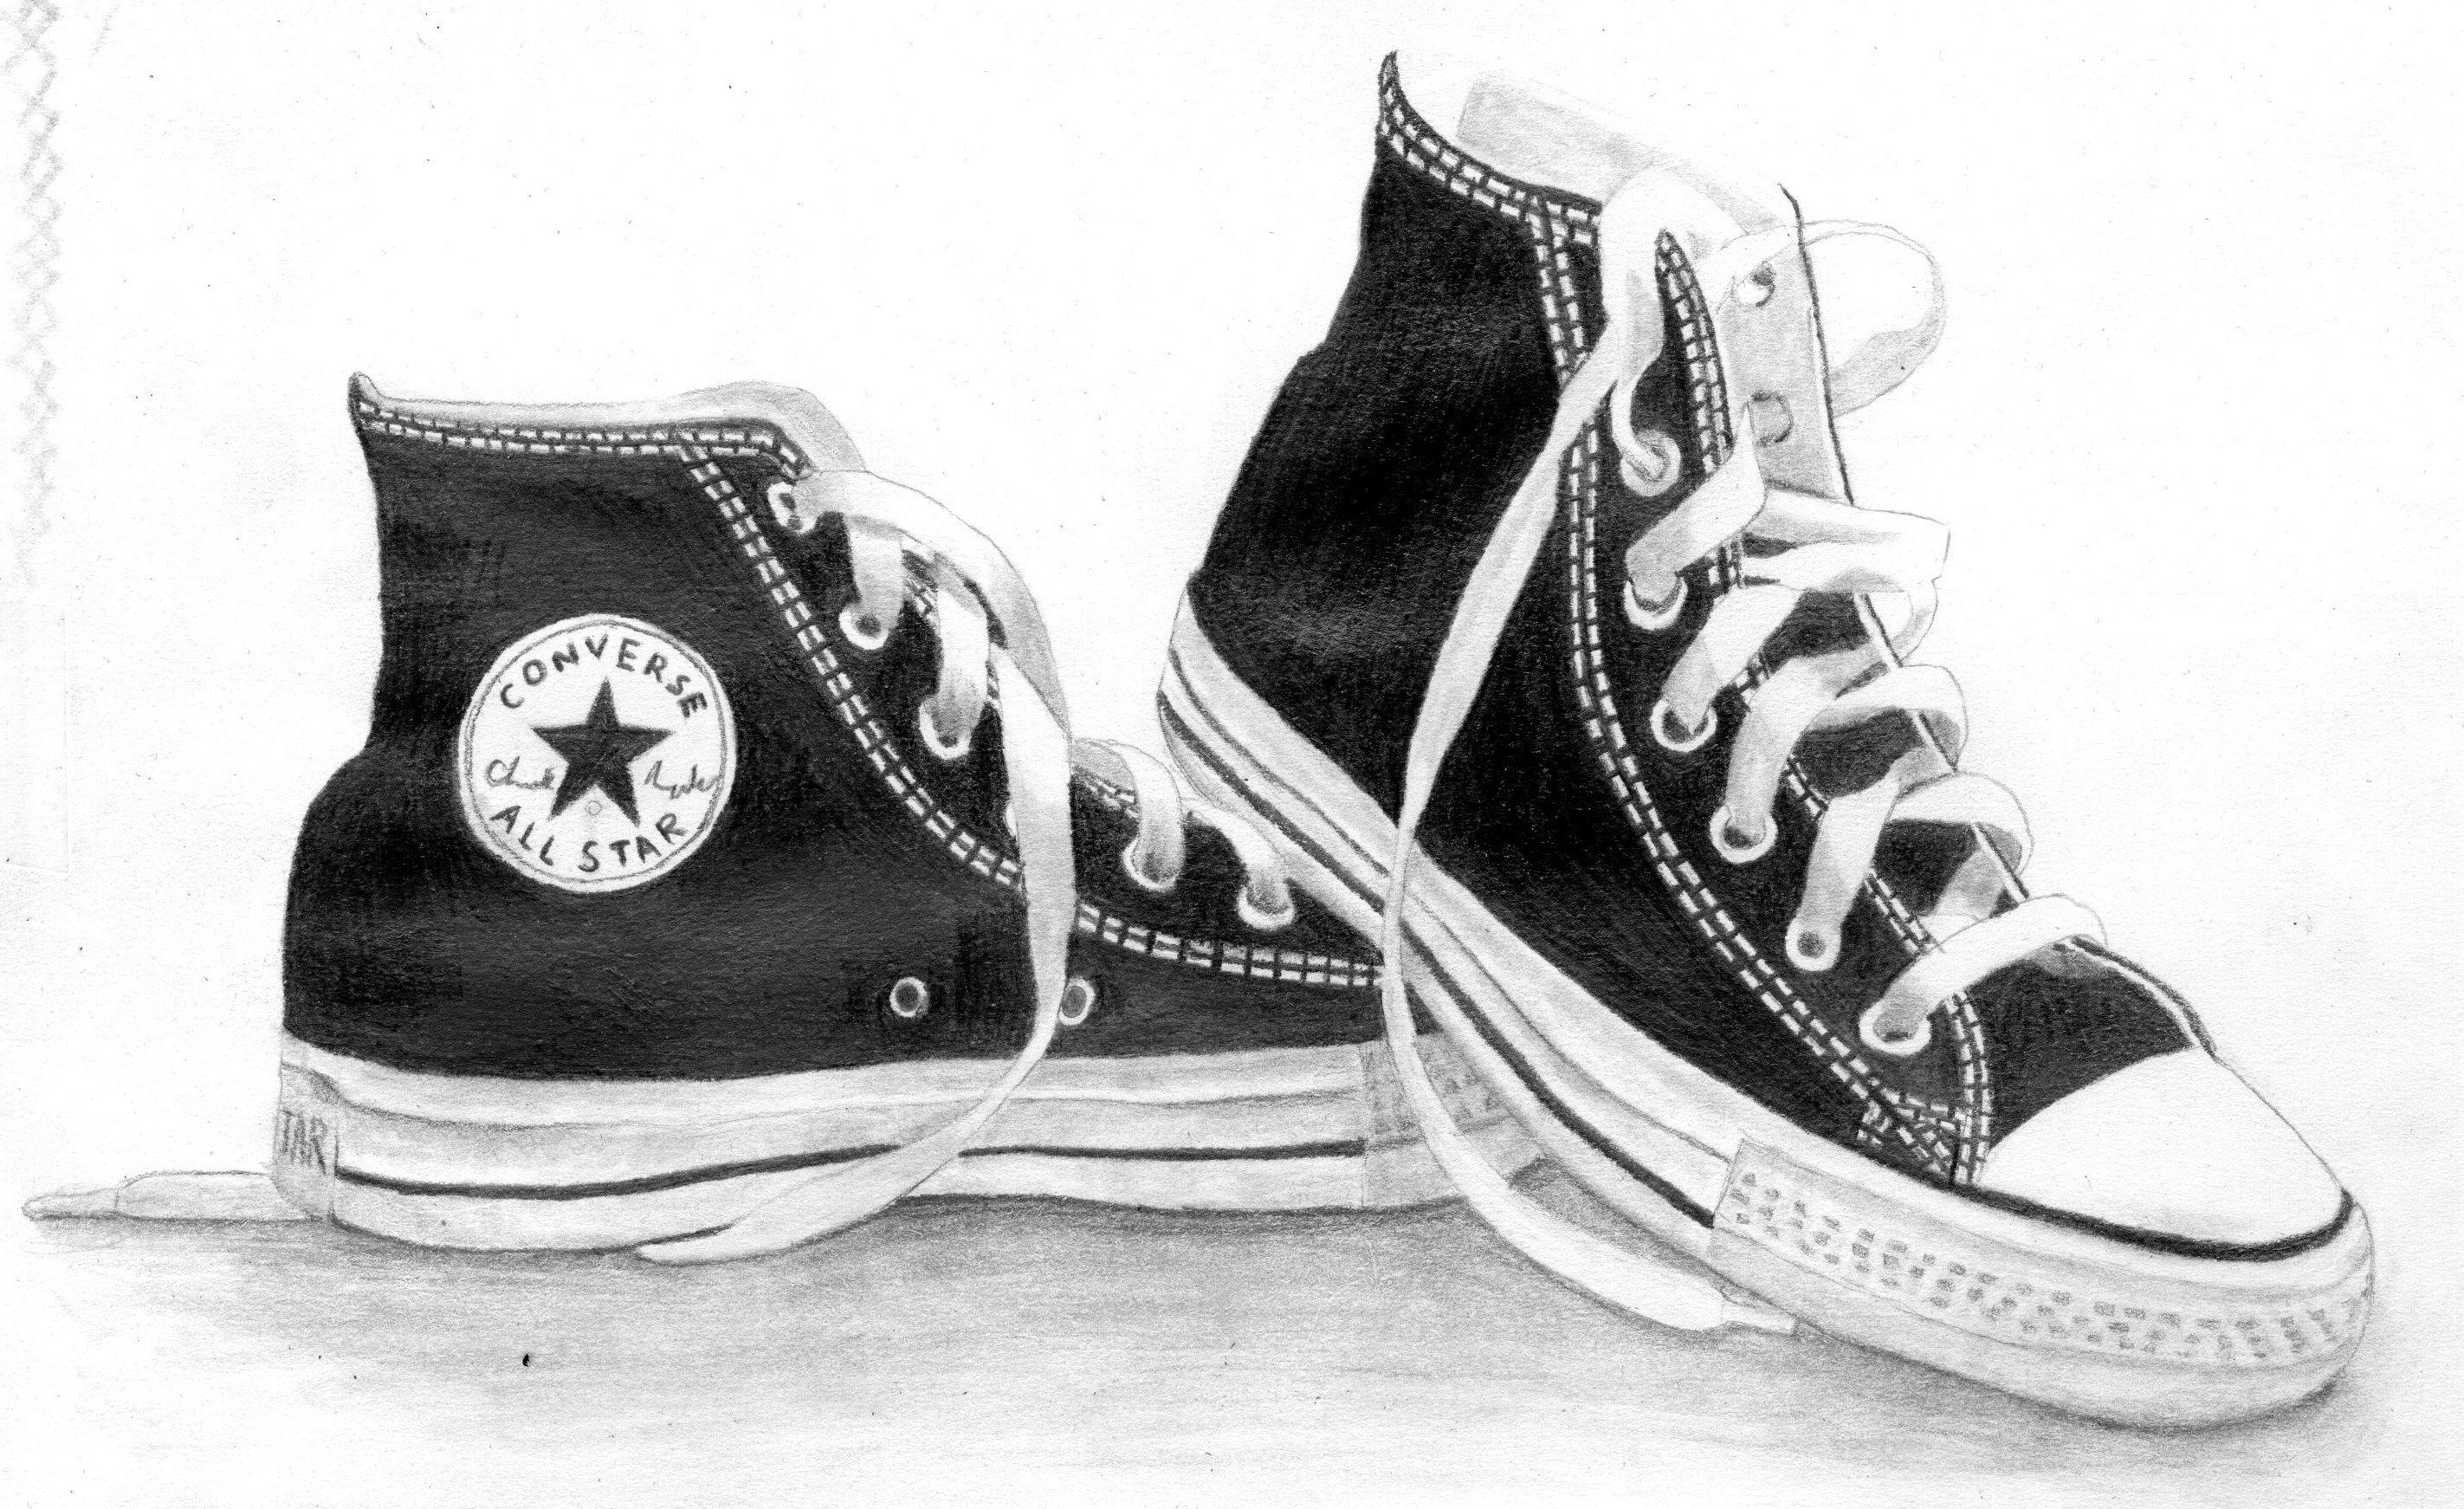 717c15b6189b Converse (shoe company)